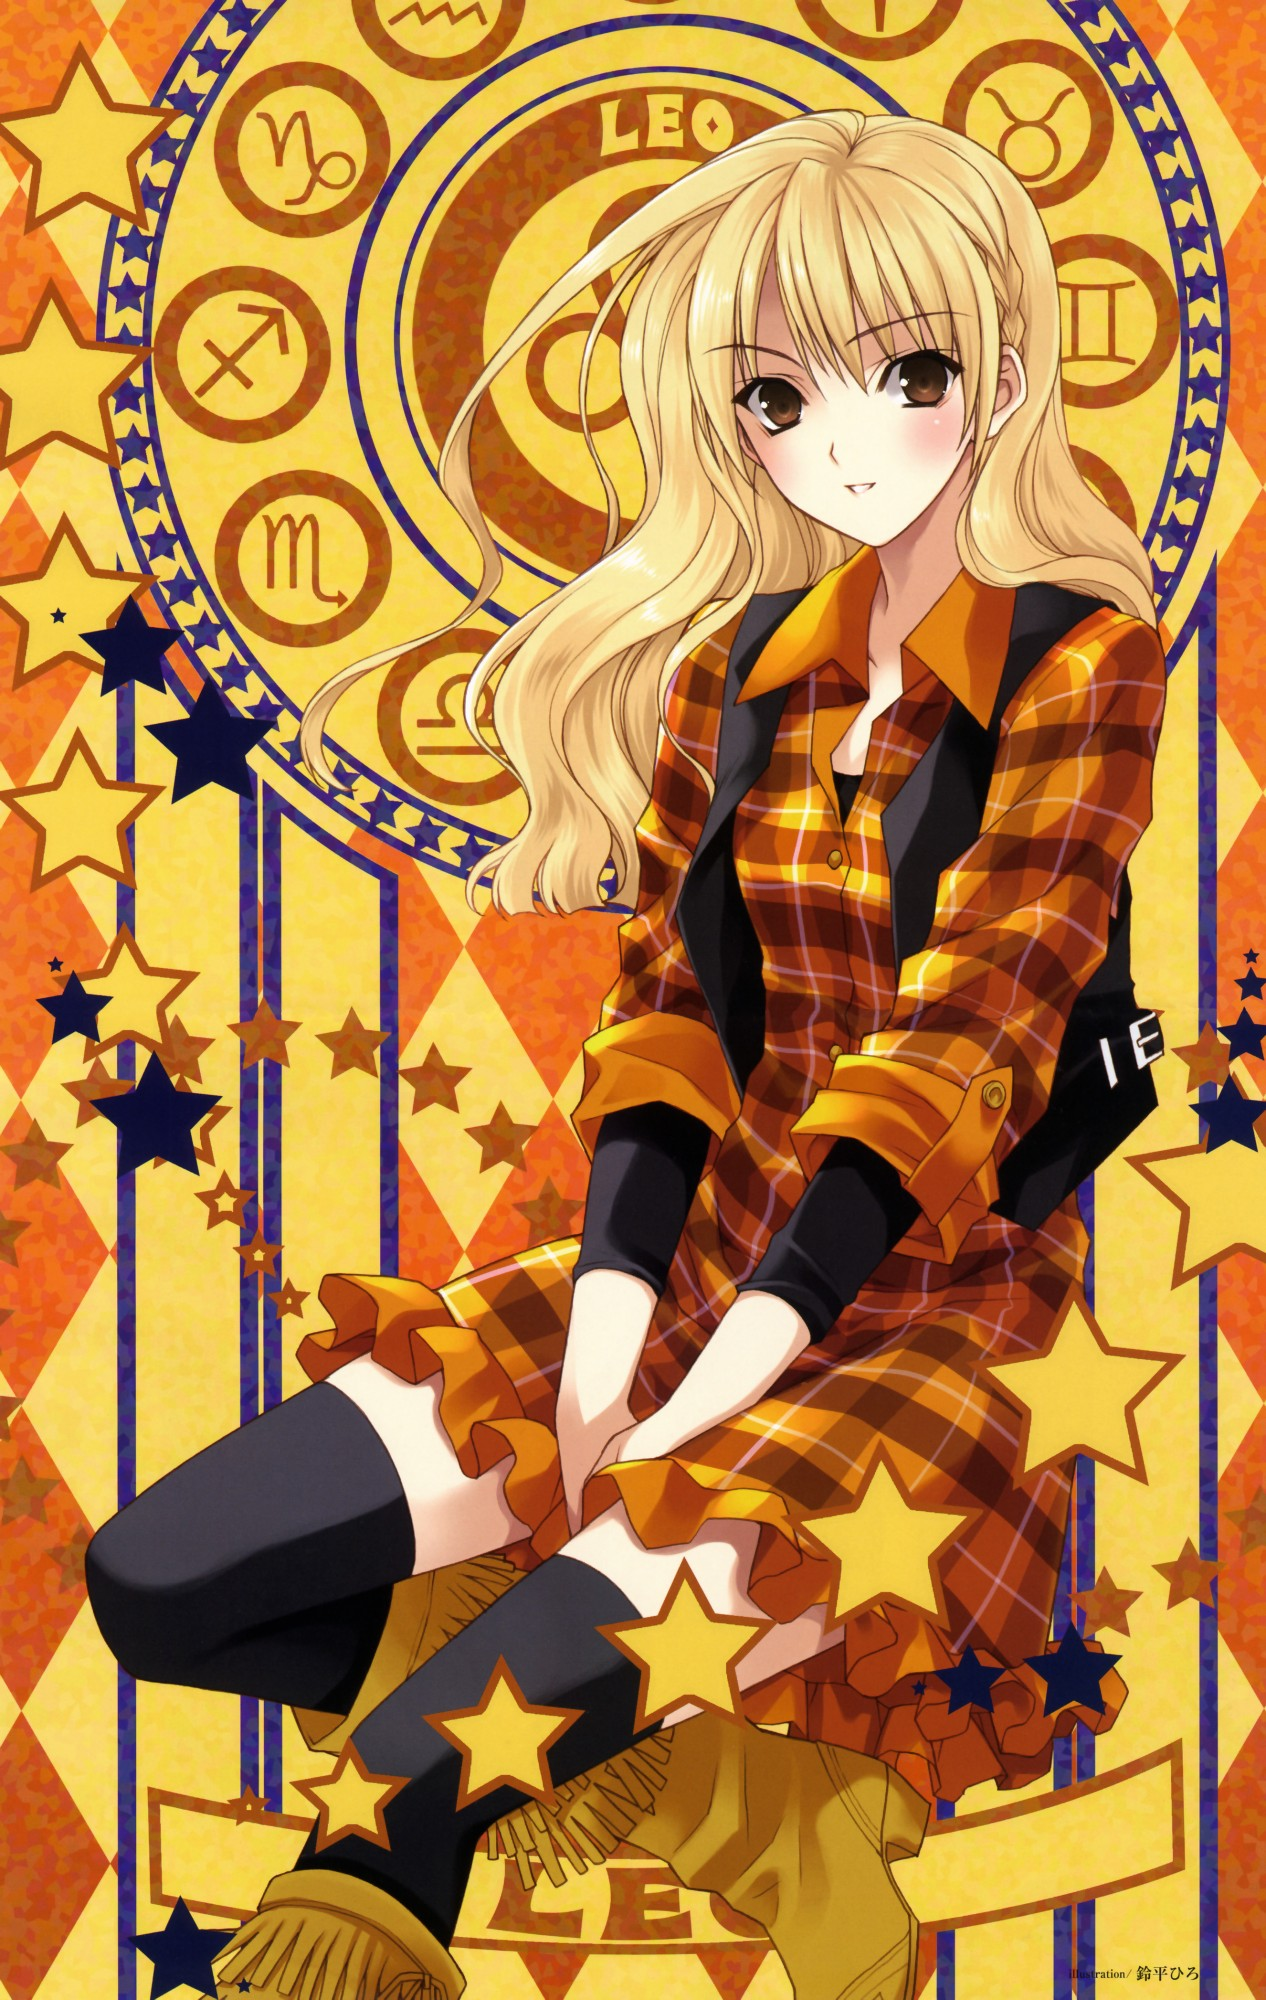 Leo Zodiac Mobile Wallpaper 6906 Zerochan Anime Image Board